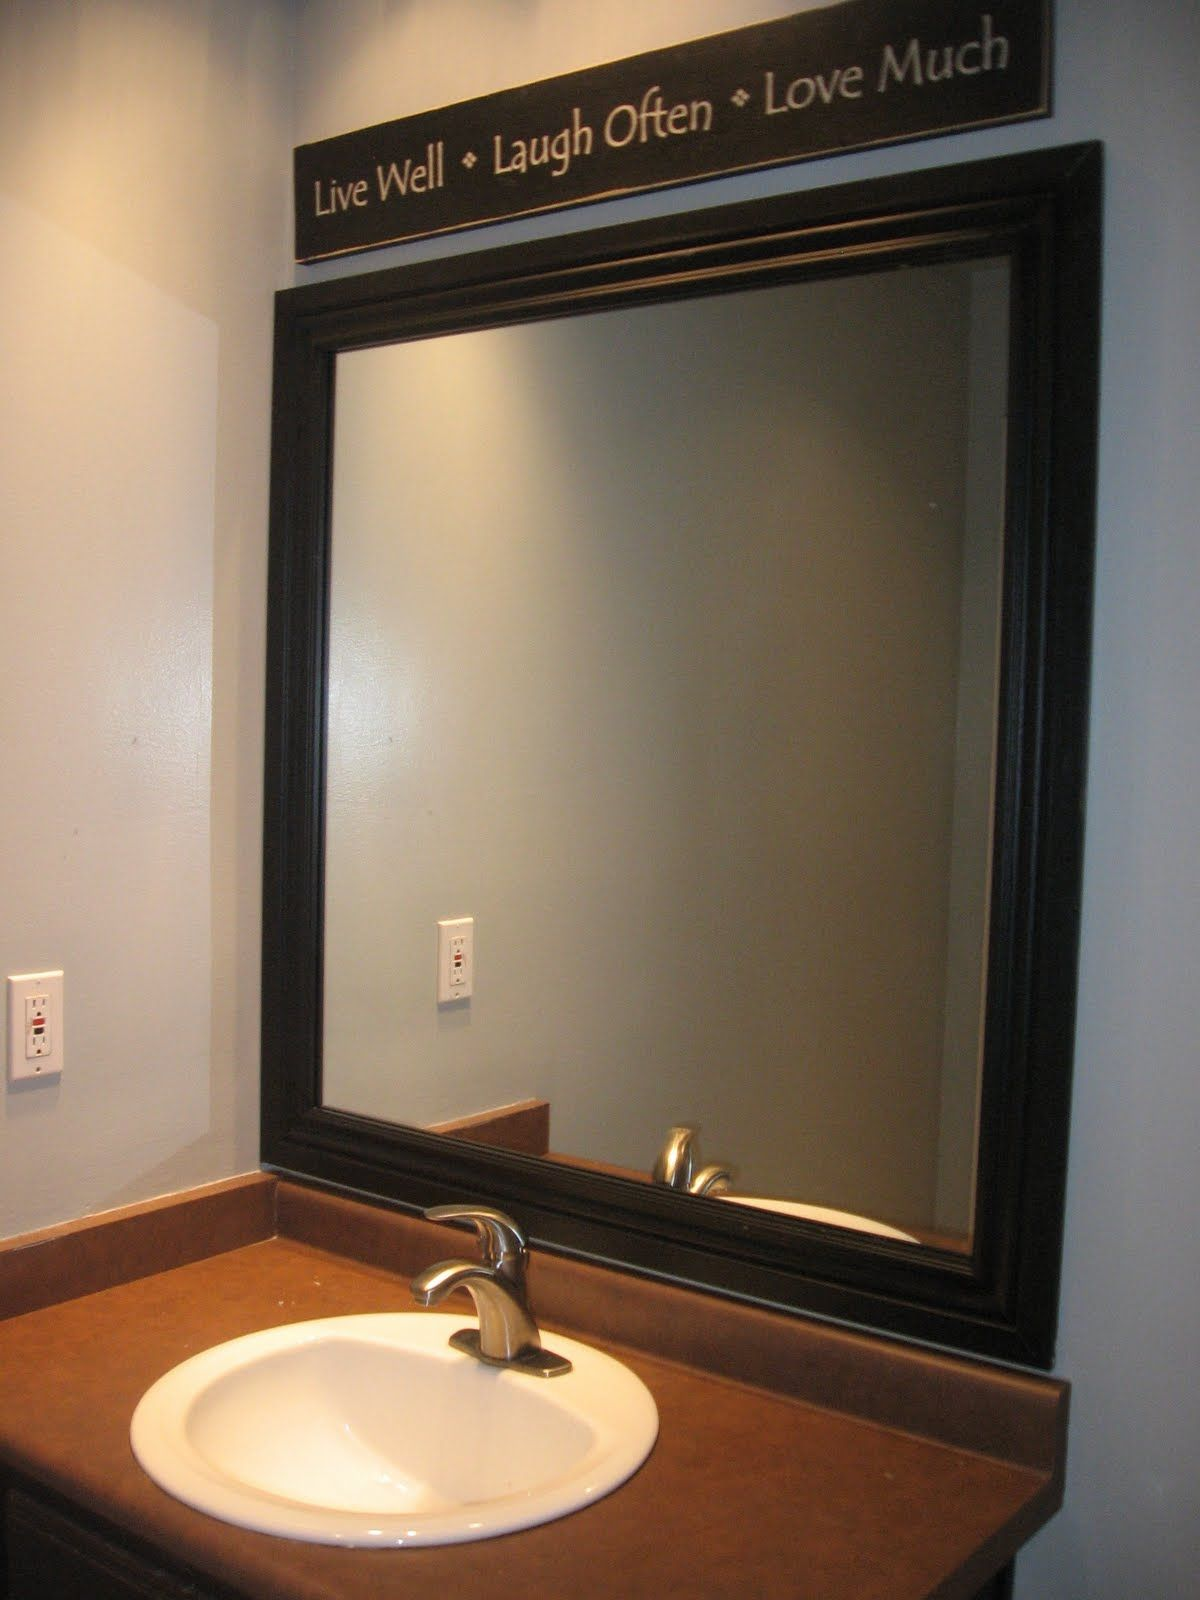 25+ Best Bathroom Mirror Ideas For a Small Bathroom | Pinterest ...